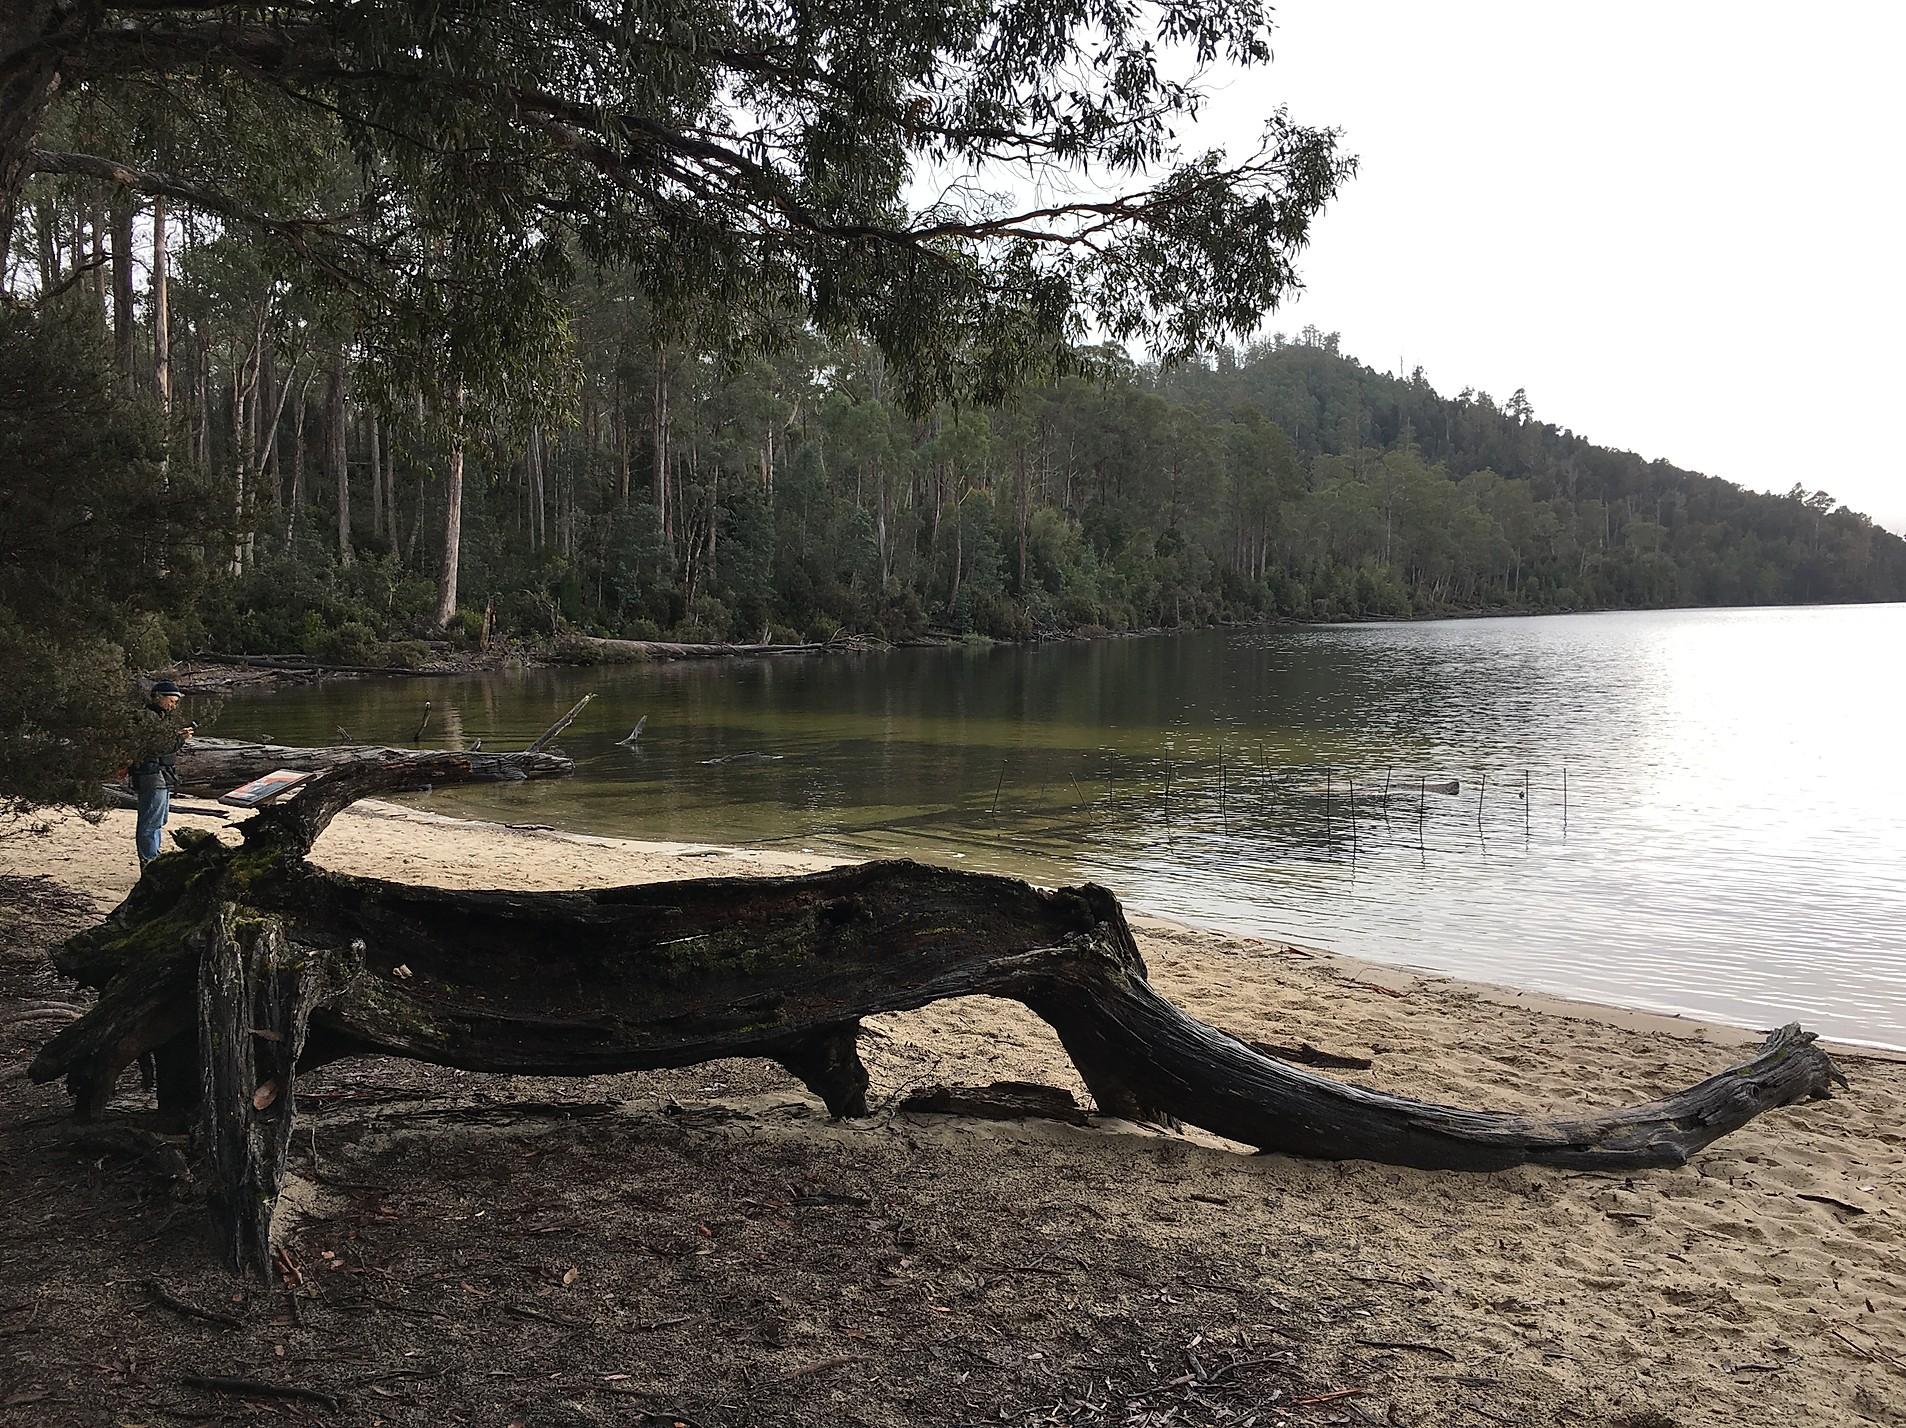 lake St Clair, озеро Сант Клэр — Тасмания 2017 — Блог о путешествиях Сергея Чеботова